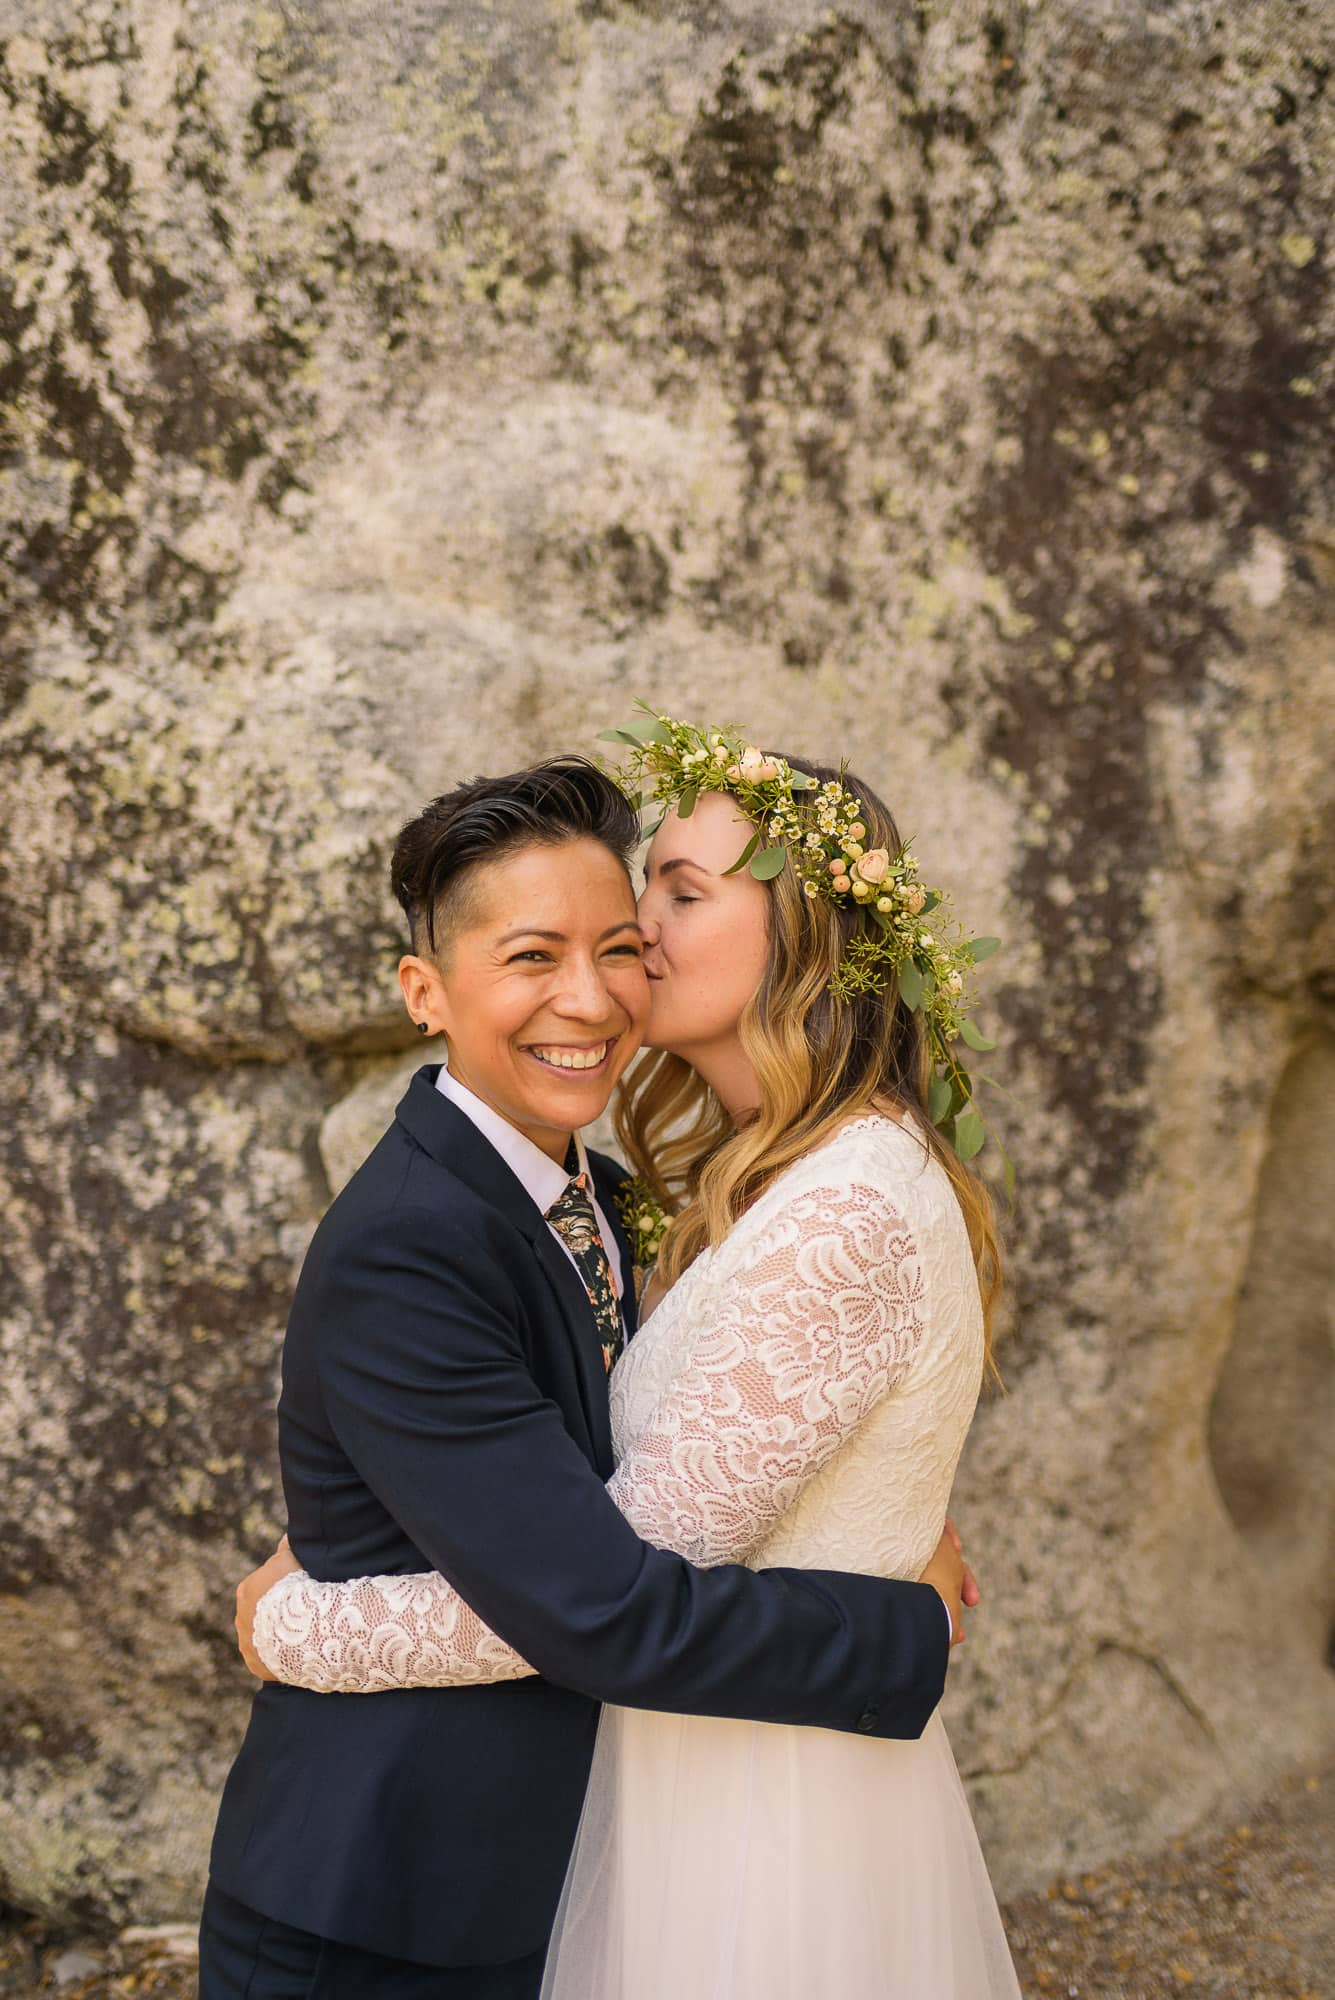 018_Alan_and_Heidi_Idylwild_Lesbian_Elopement